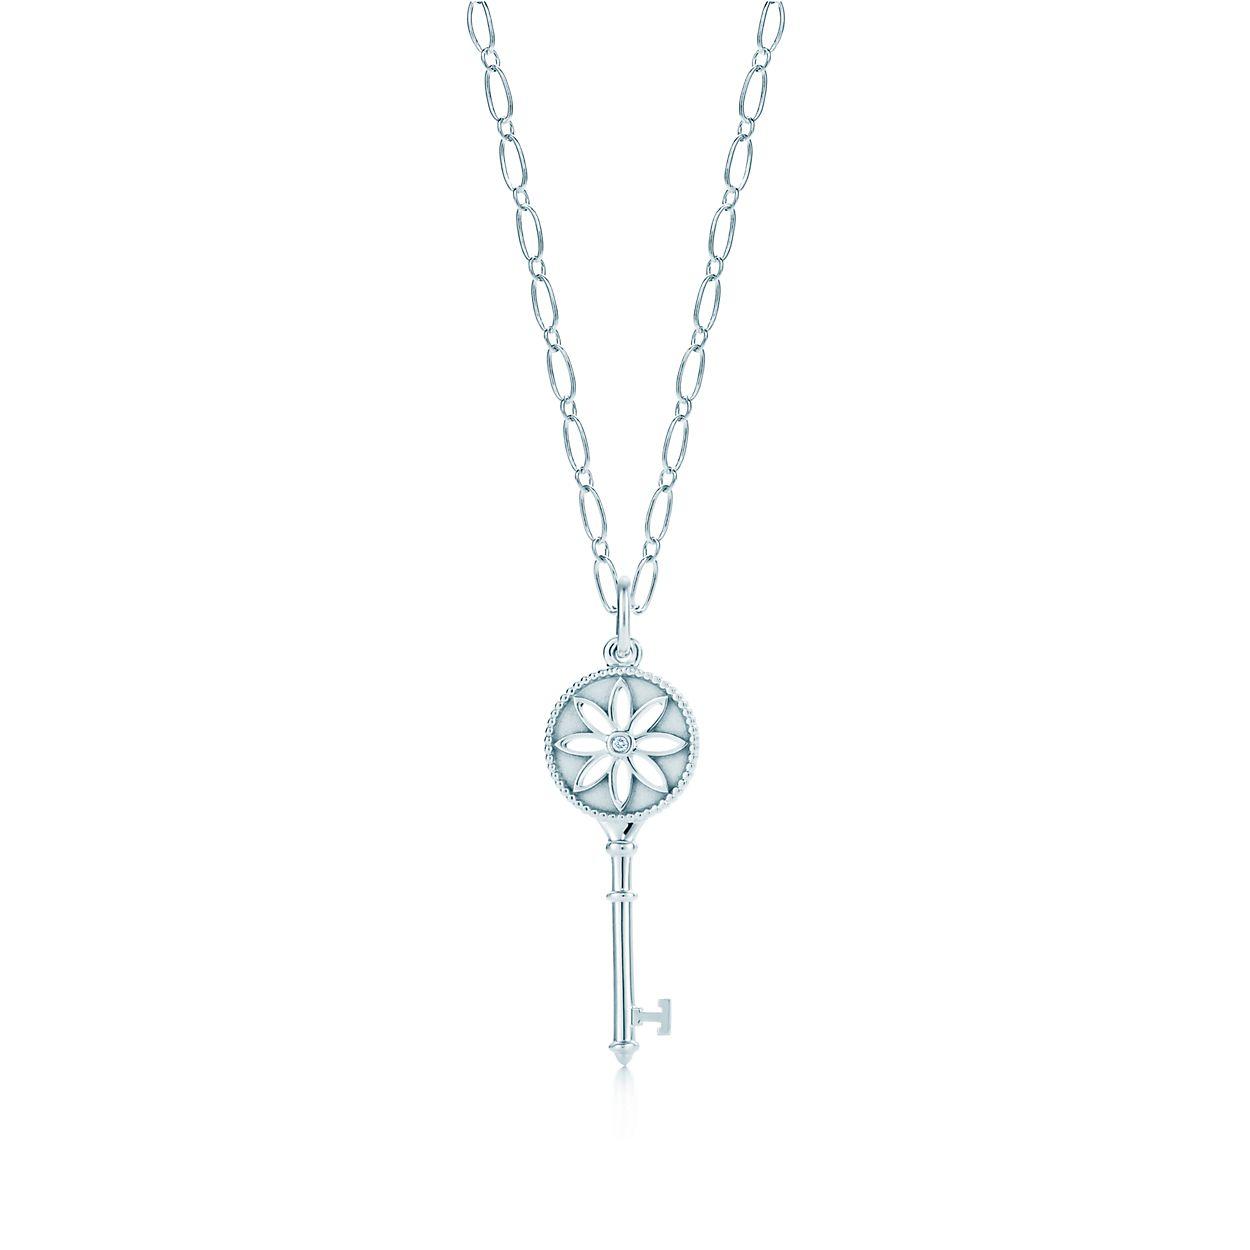 Tiffany keys daisy key pendant in silver with a diamond on an oval tiffany keysdaisy key pendant aloadofball Images